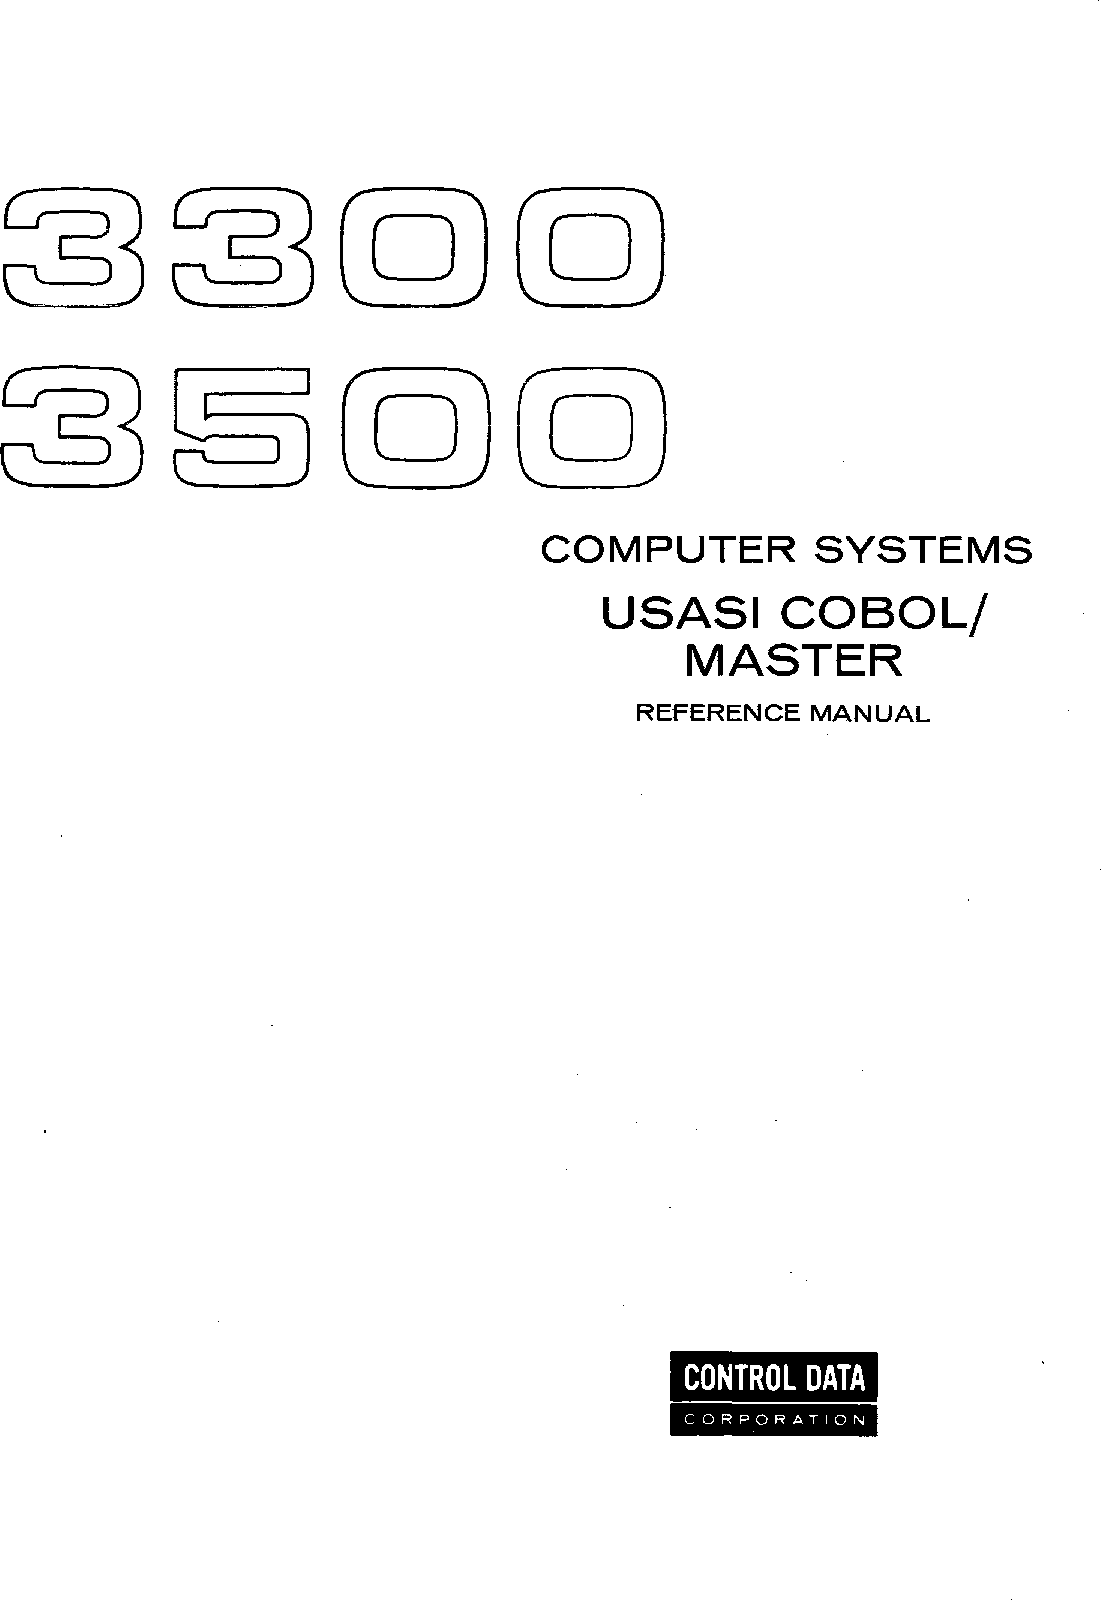 60229400_3300_COBOL_MASTER_Feb69 60229400 3300 COBOL MASTER Feb69